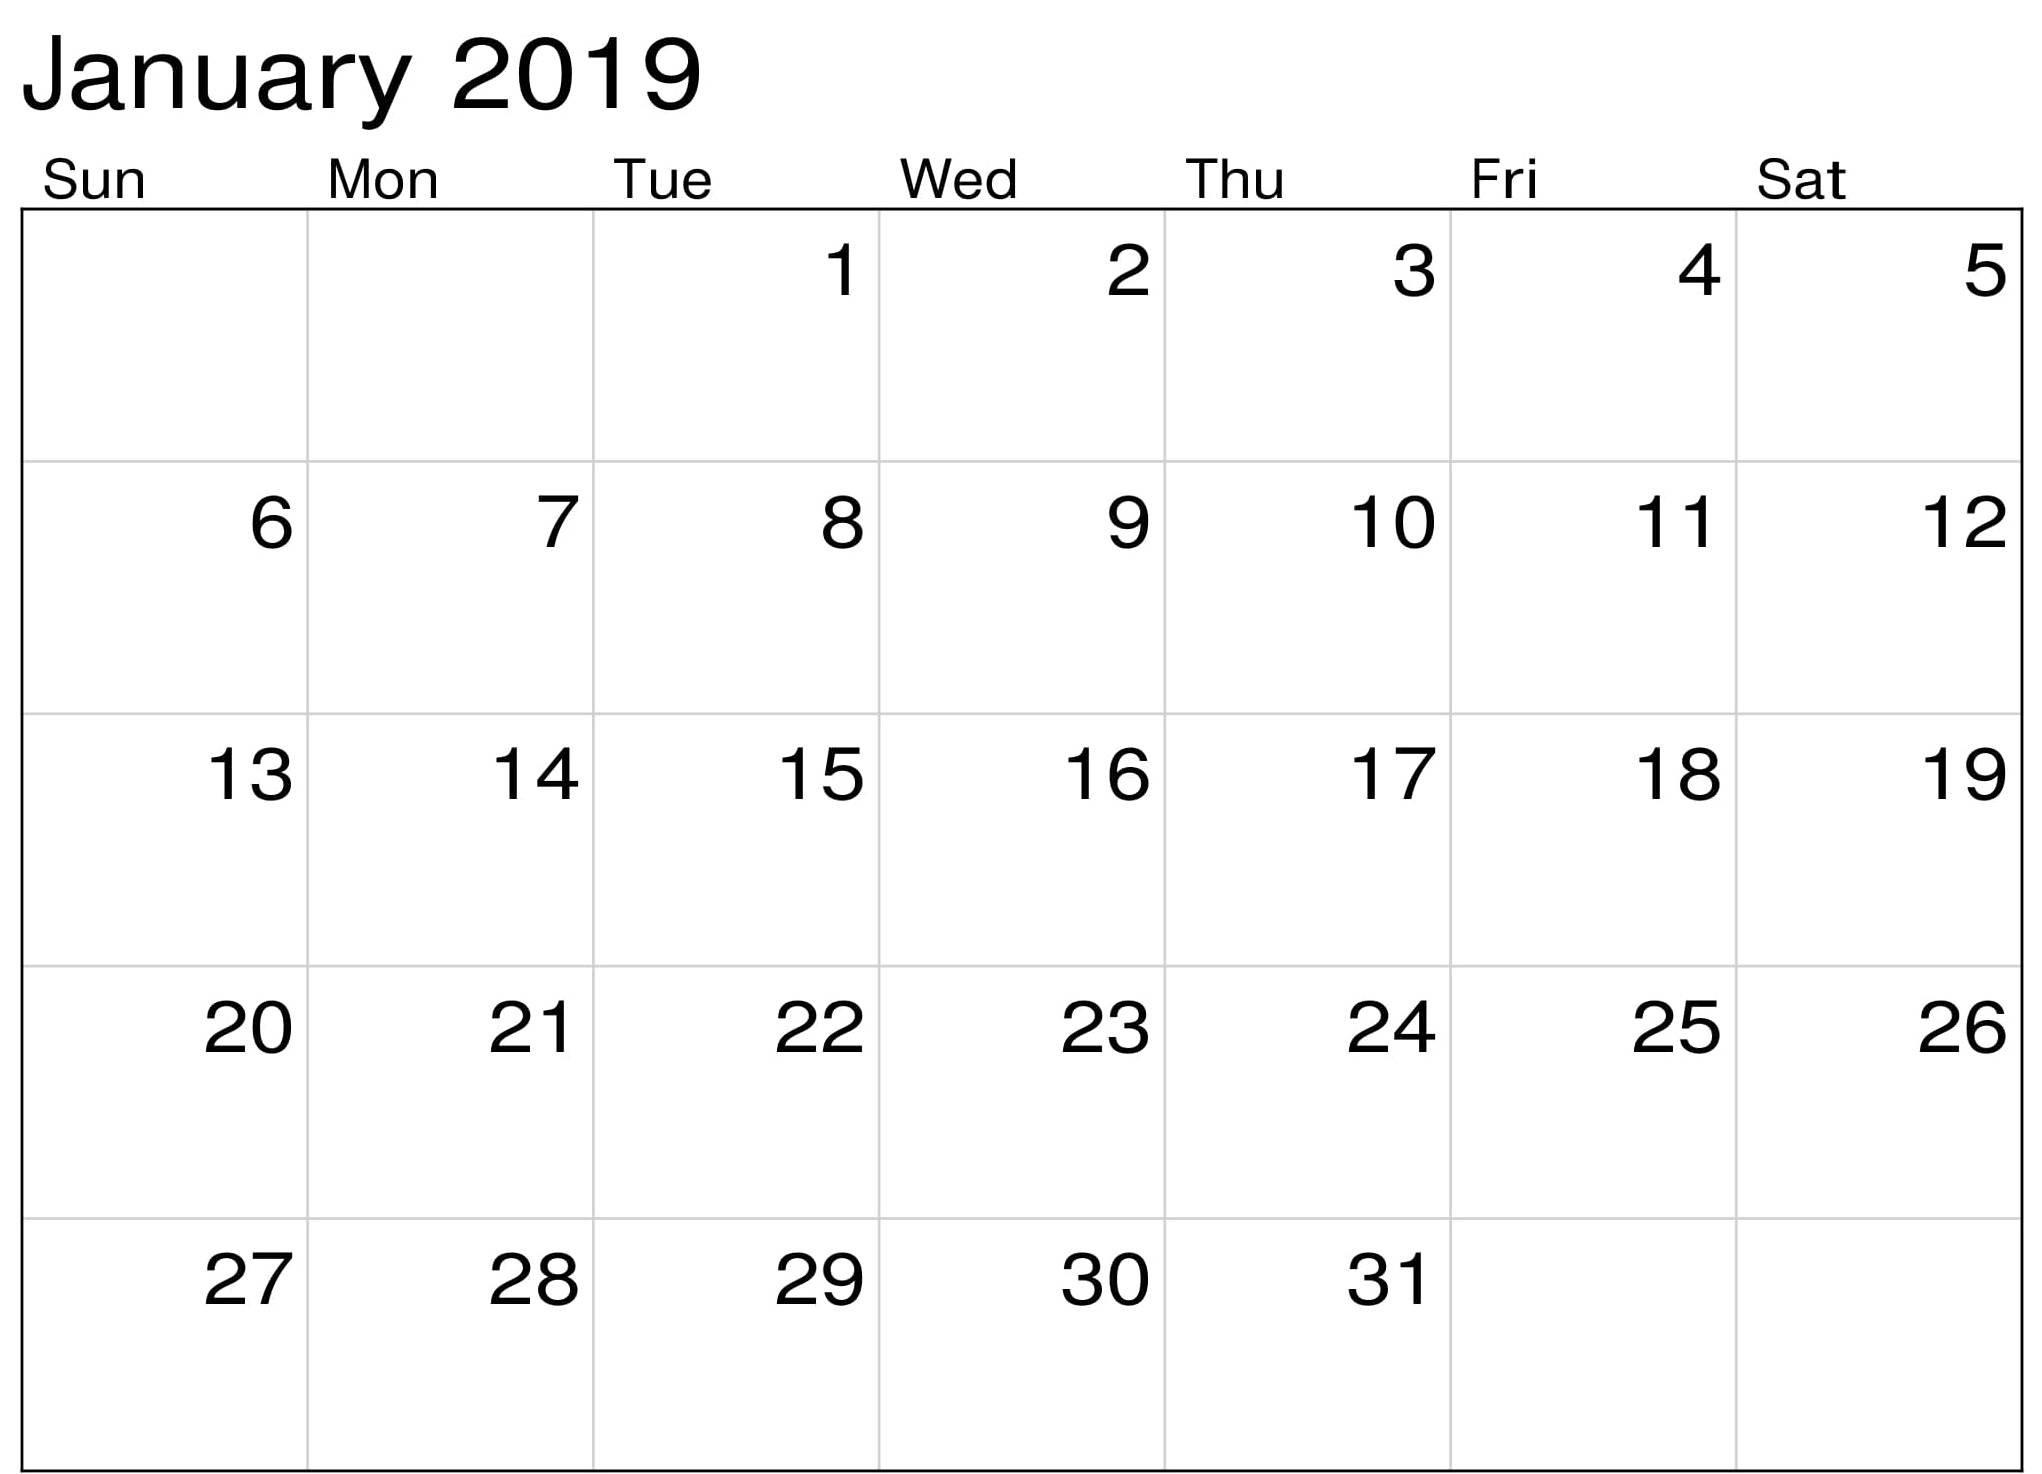 2019 January Calendar Png – Task Management Template Worksheet Calendar 2019 Png